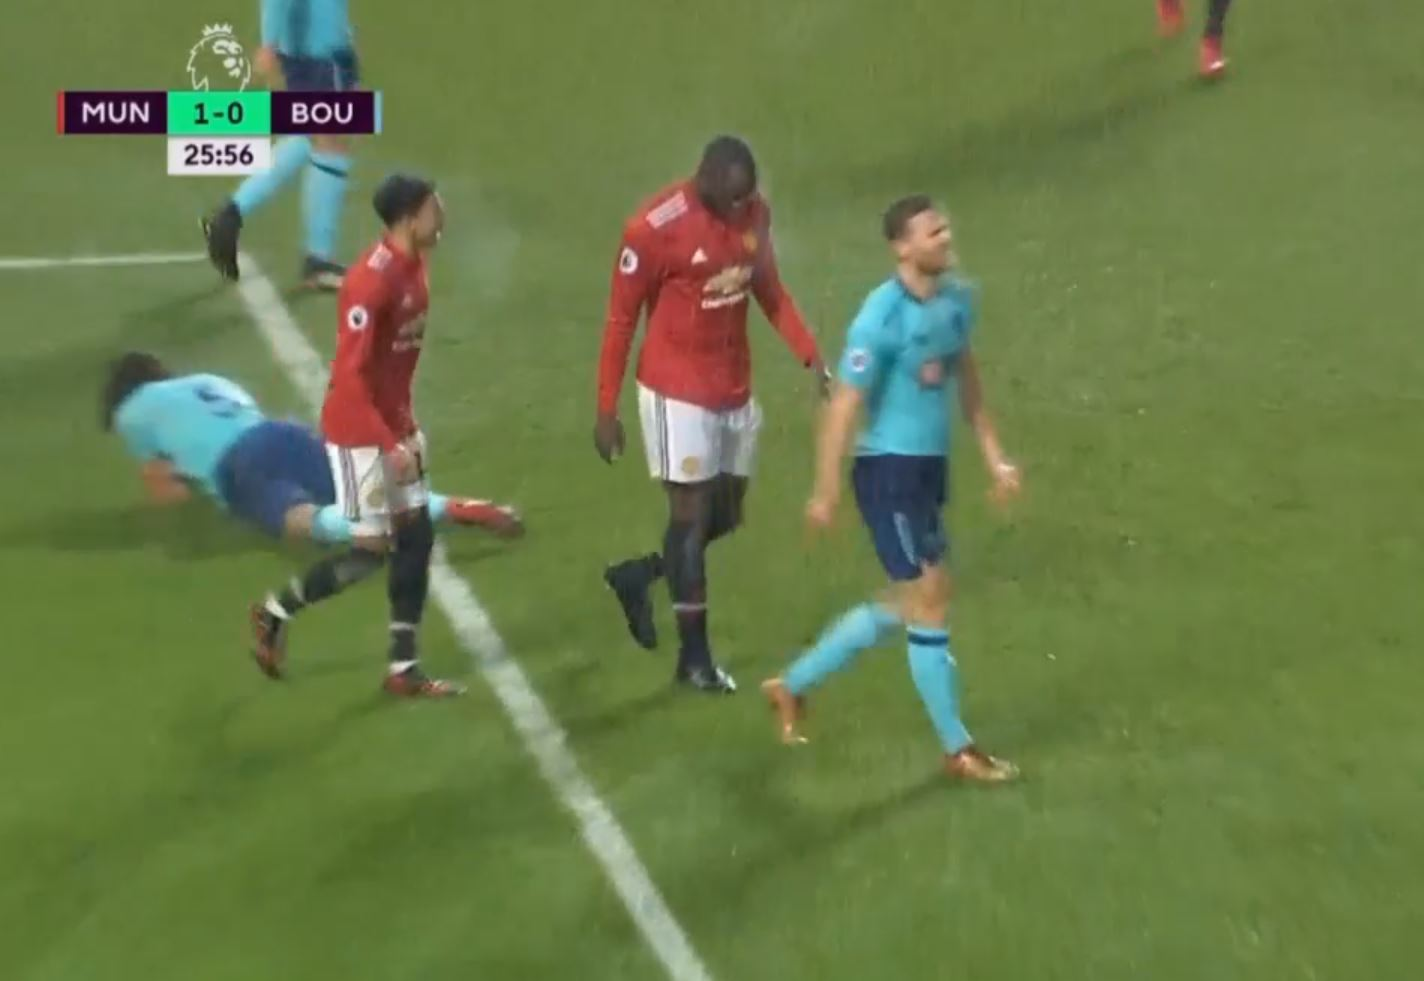 Romelu Lukaku silences critics with ice-cold reaction to goal vs Bournemouth